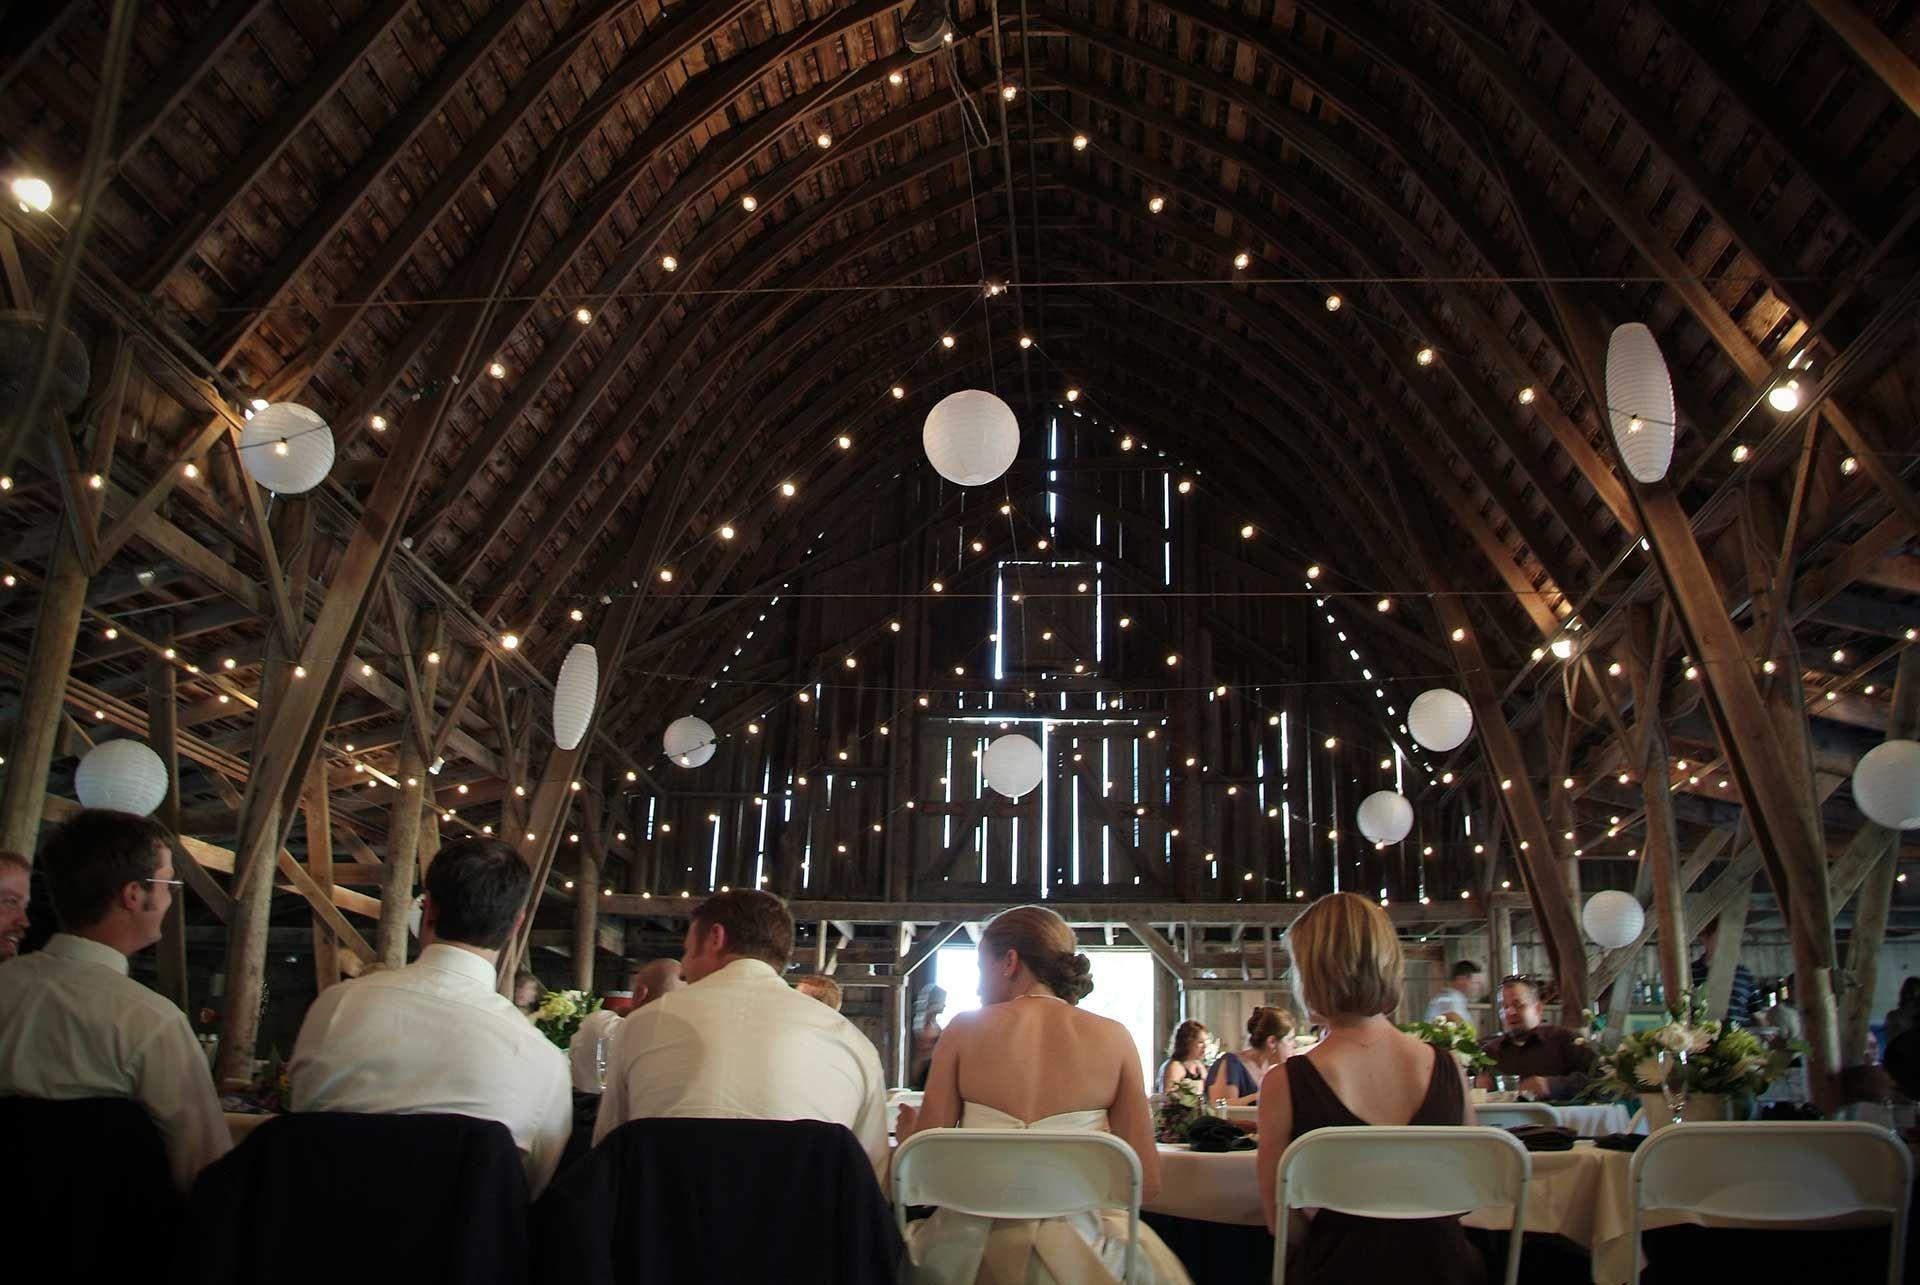 Historic Barns set for an outdoor wedding Weddings Gallery Lied Lodge and Arbor Day Farm Nebraska City NE venues nebraskaweddings